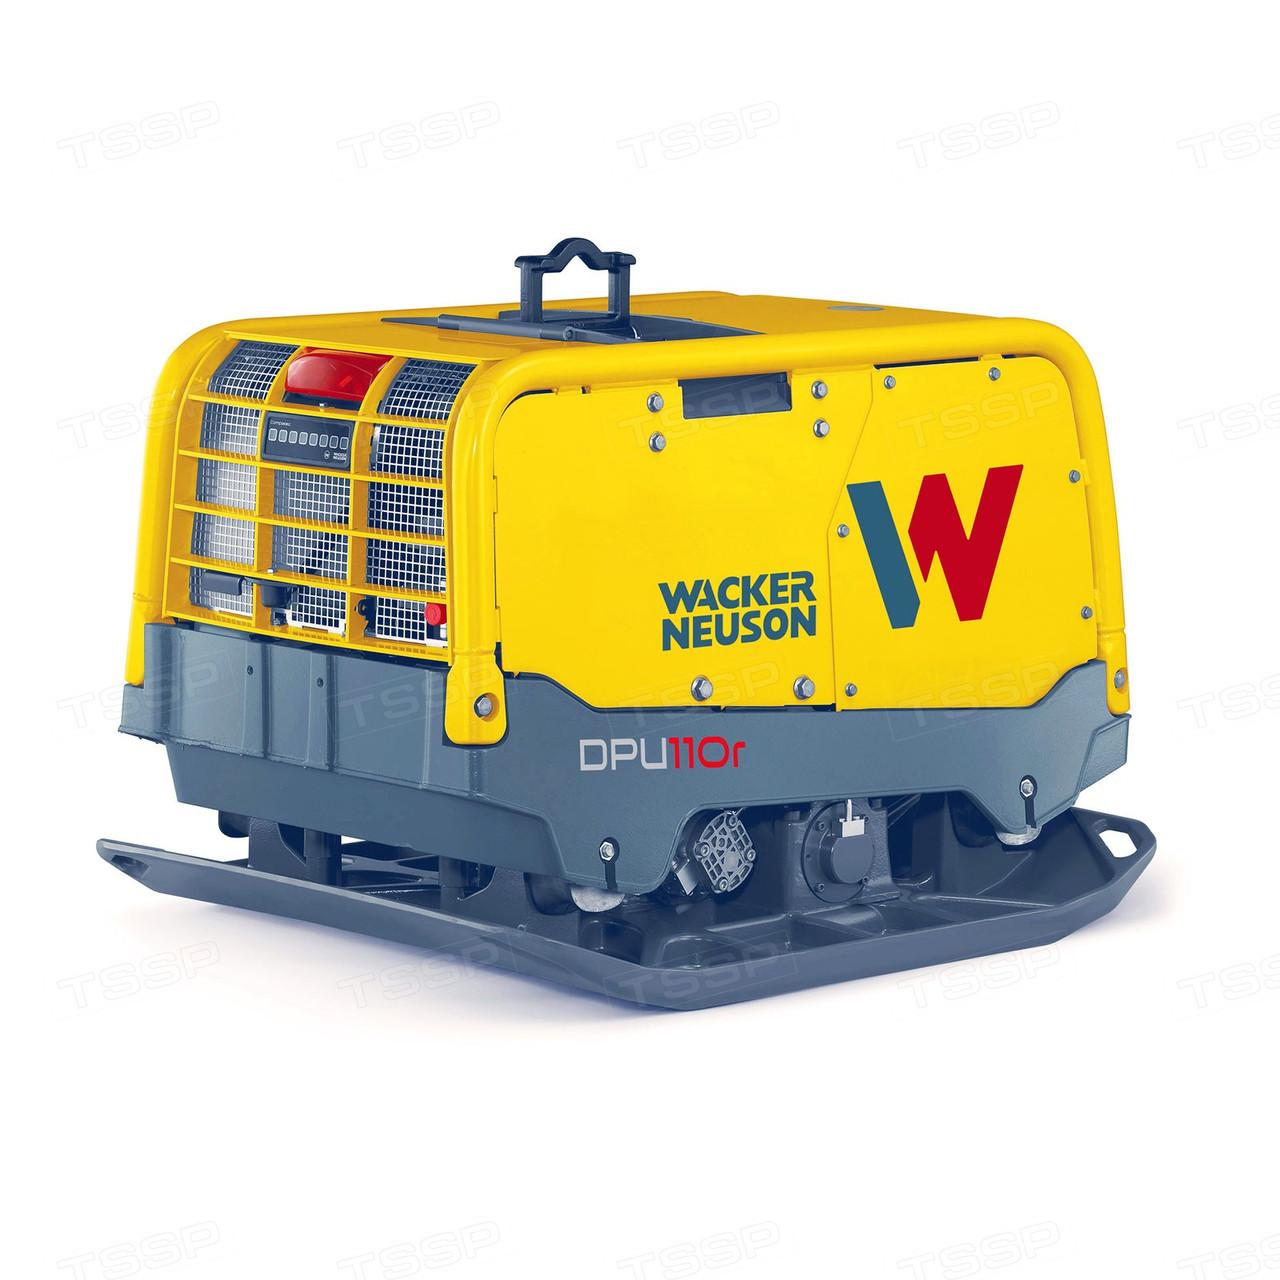 Виброплиты Wacker Neuson DPU 110r